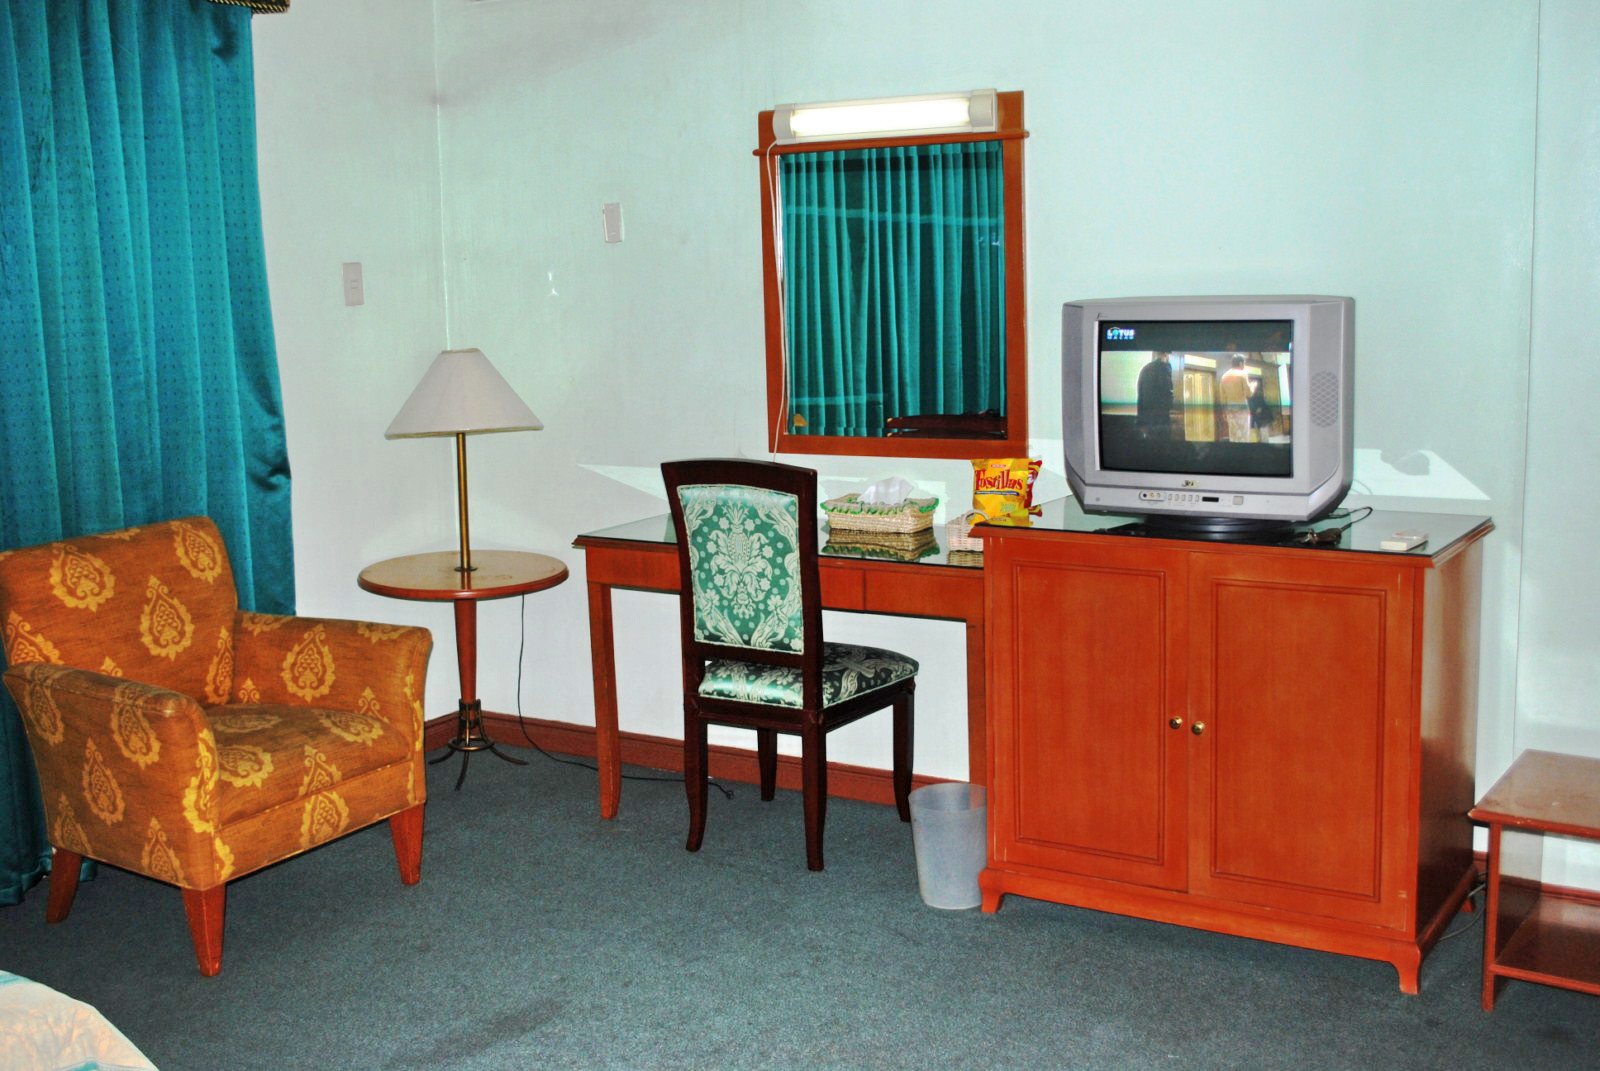 Dj Paradise Resort  U0026 Hotel  Malolos City  Bulacan   U2013 B L A